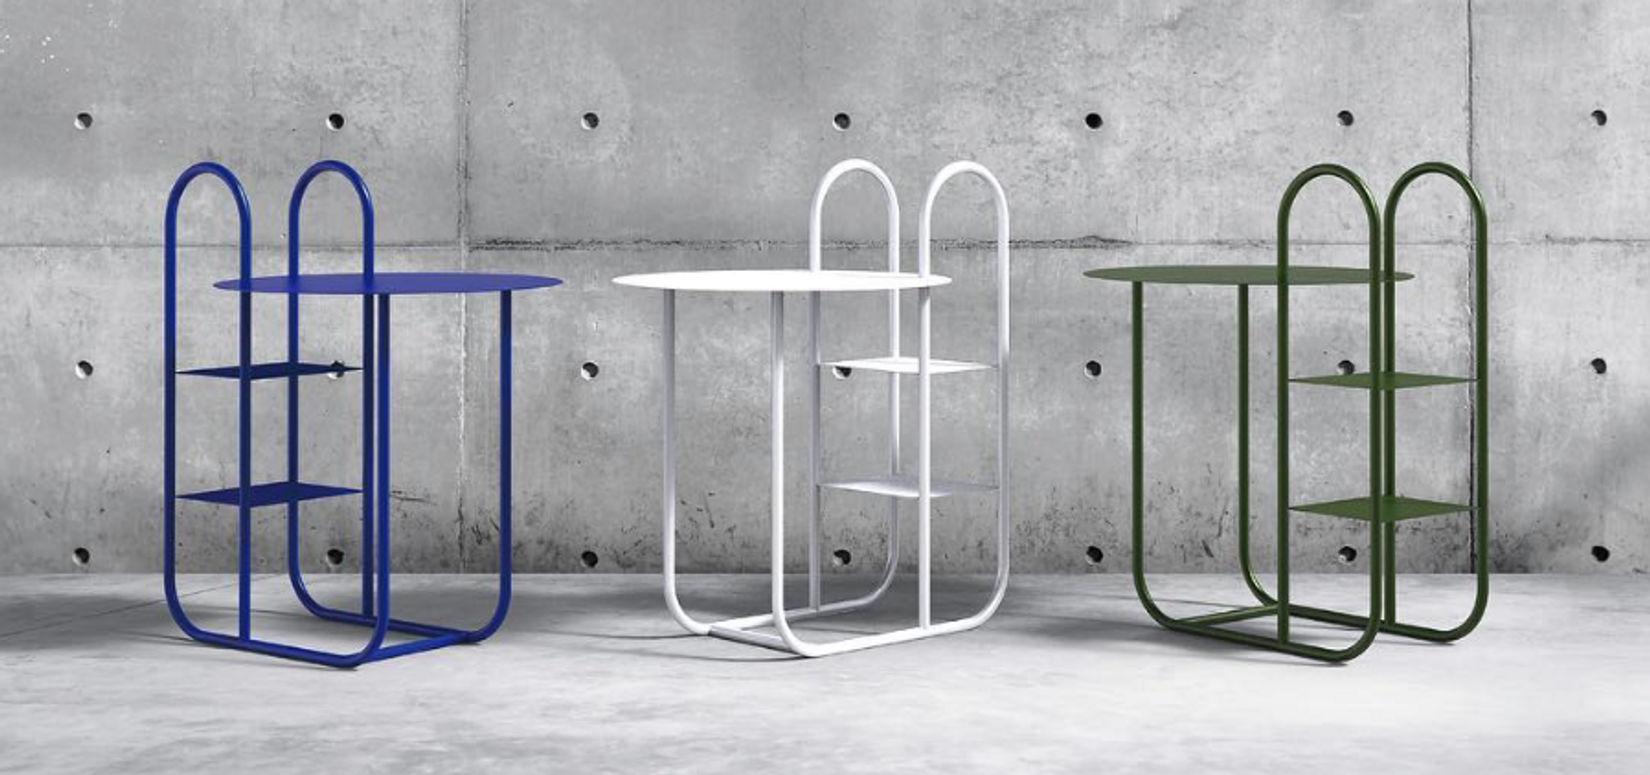 10 Creative Furniture Designs To Inspire You